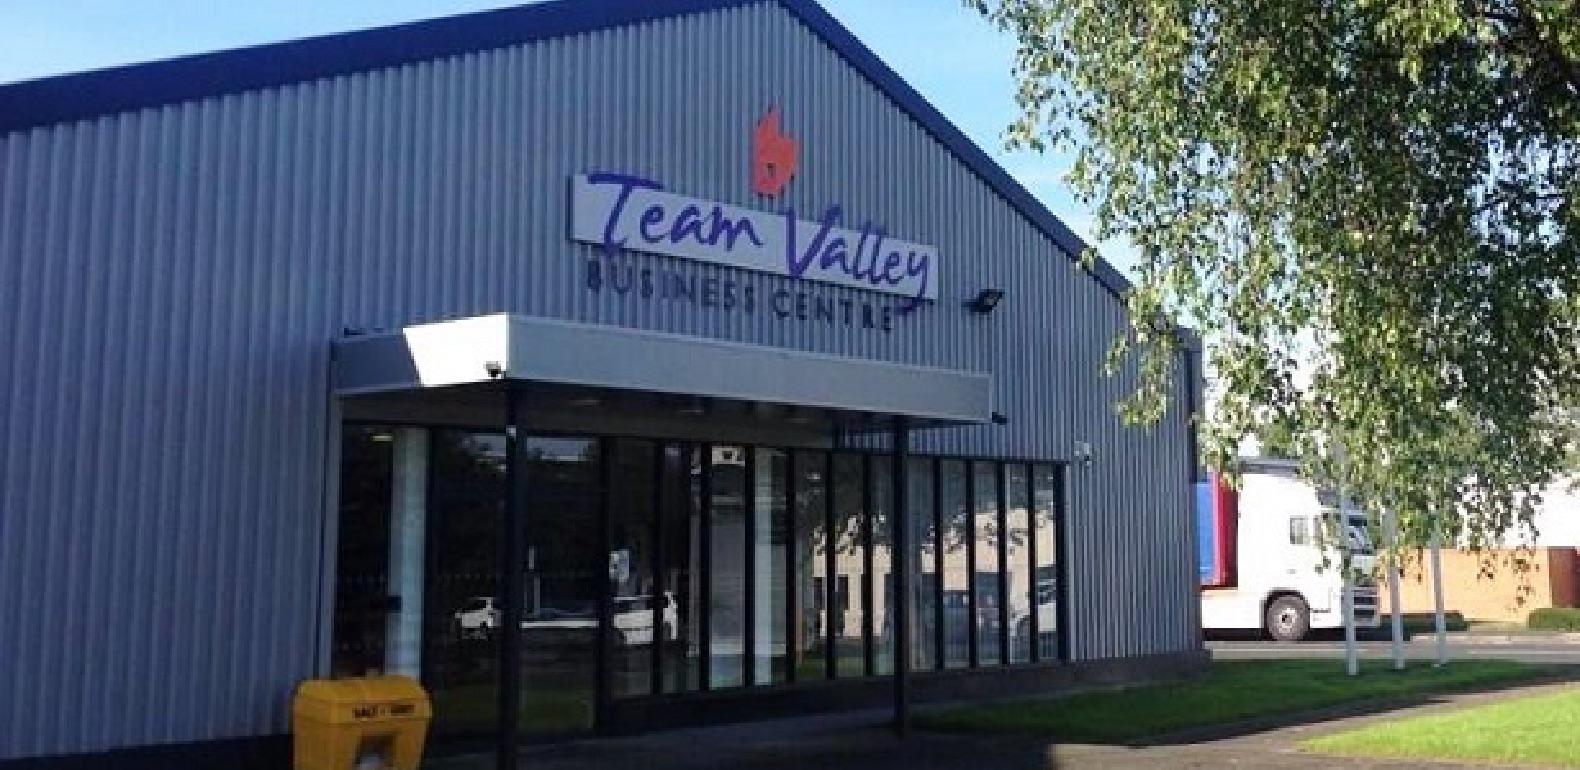 Team Valley Business Centre, Gateshead